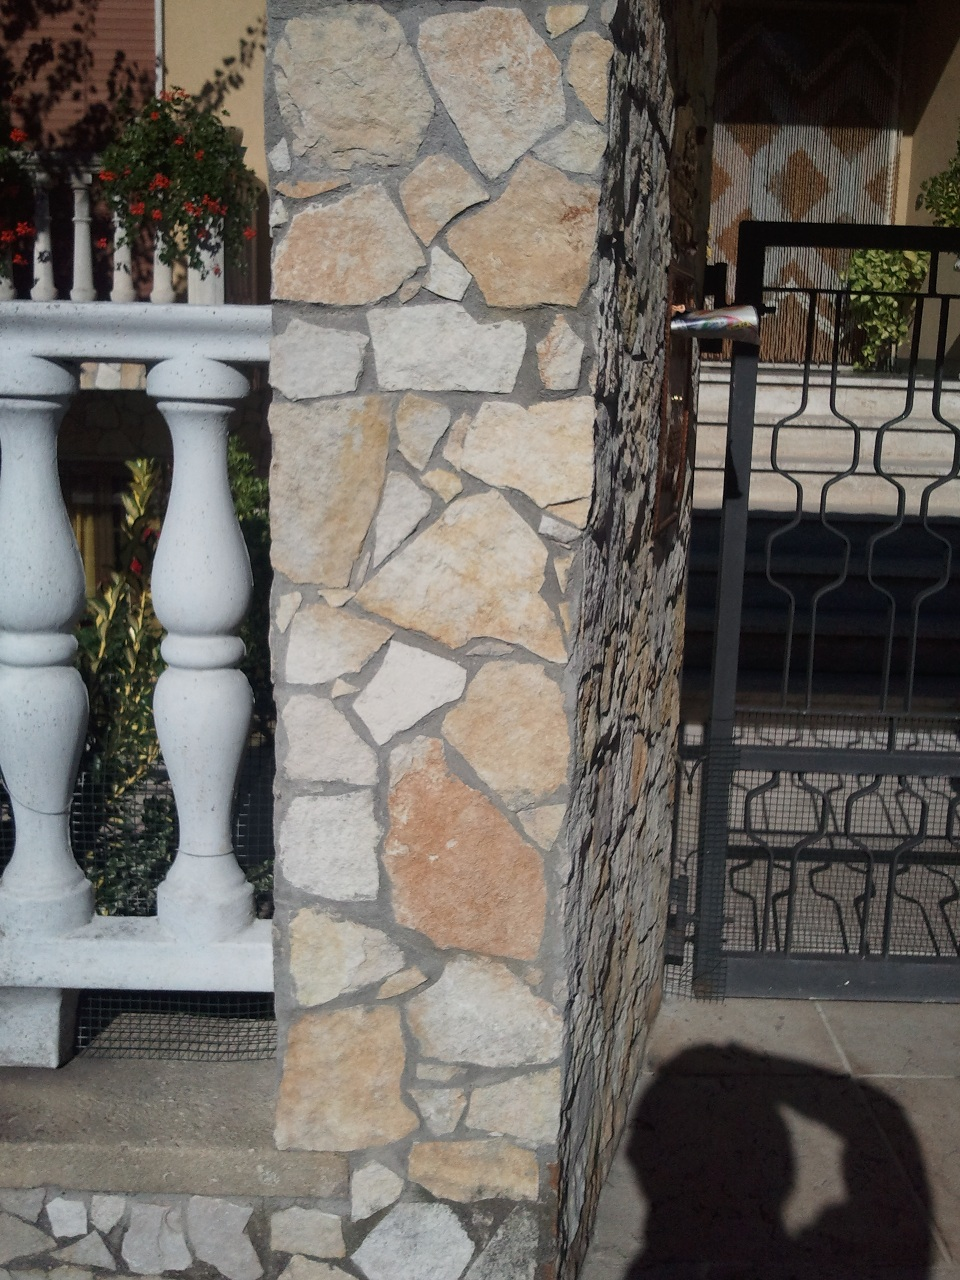 Zem enrico marmi prezzi sassi rivestimento muri super - Spessore muri interni ...